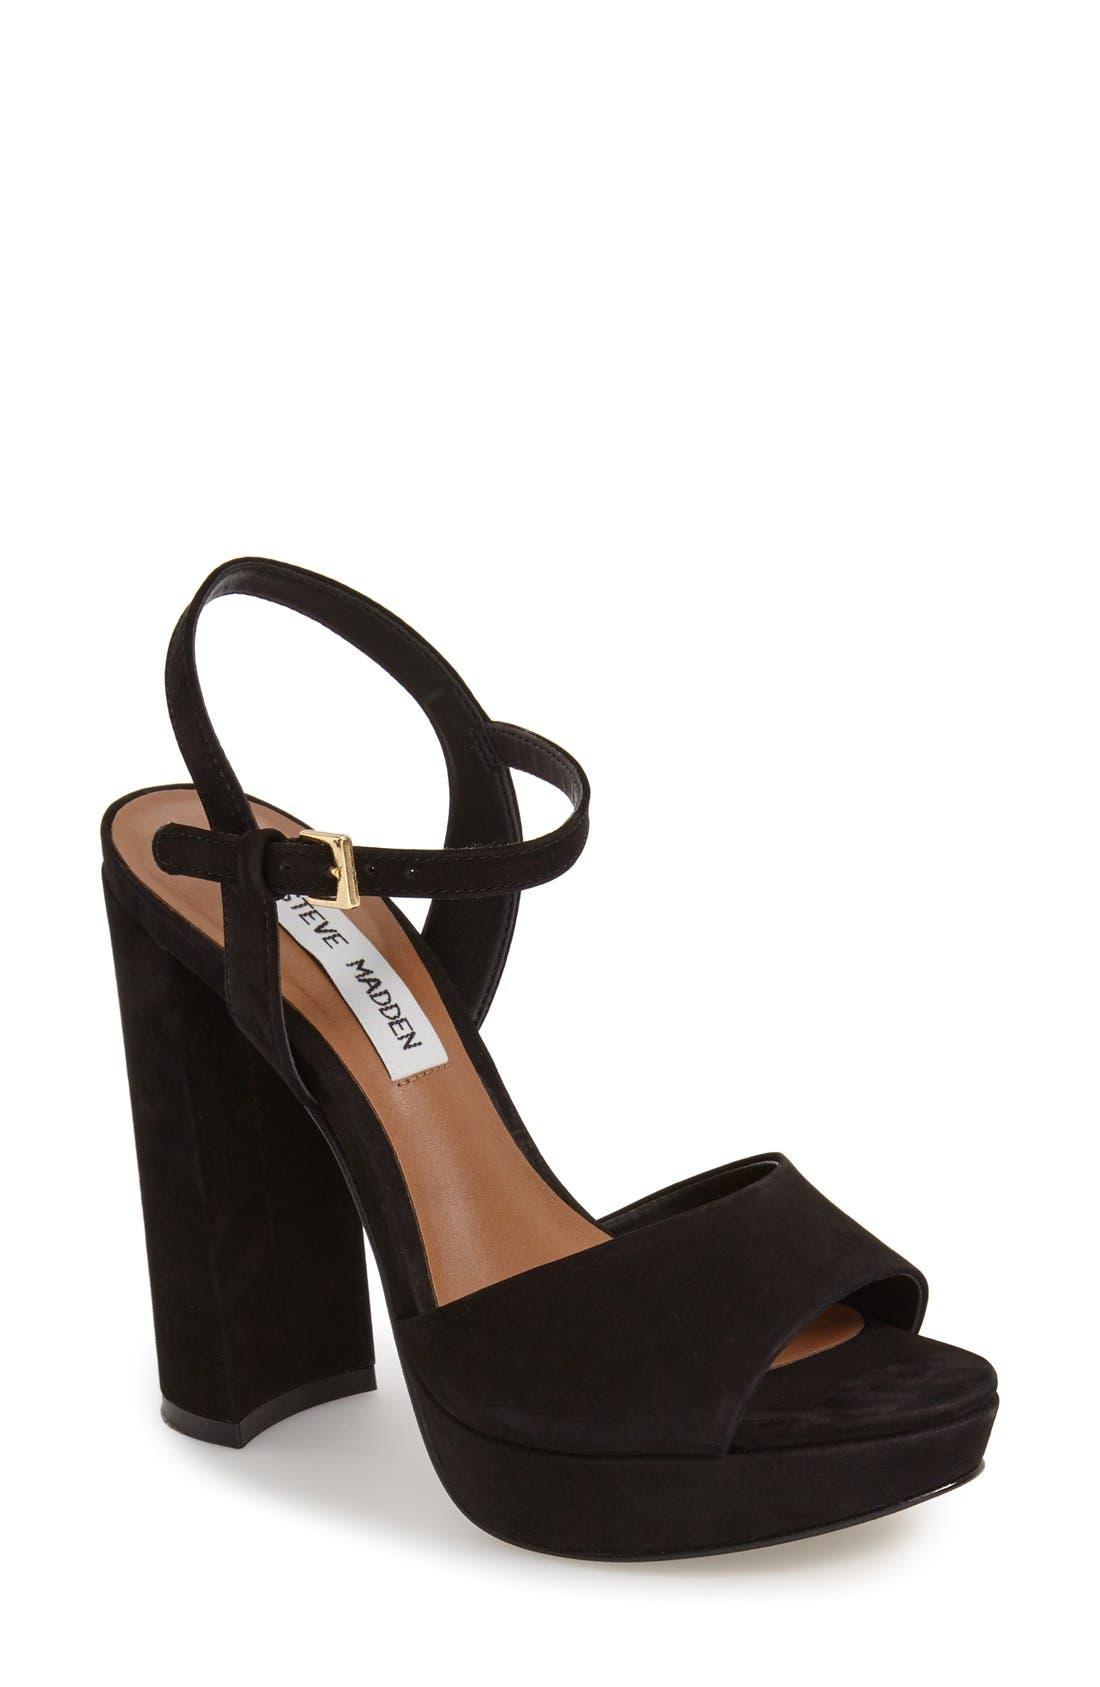 'Kierra' Platform Sandal,                             Main thumbnail 1, color,                             005